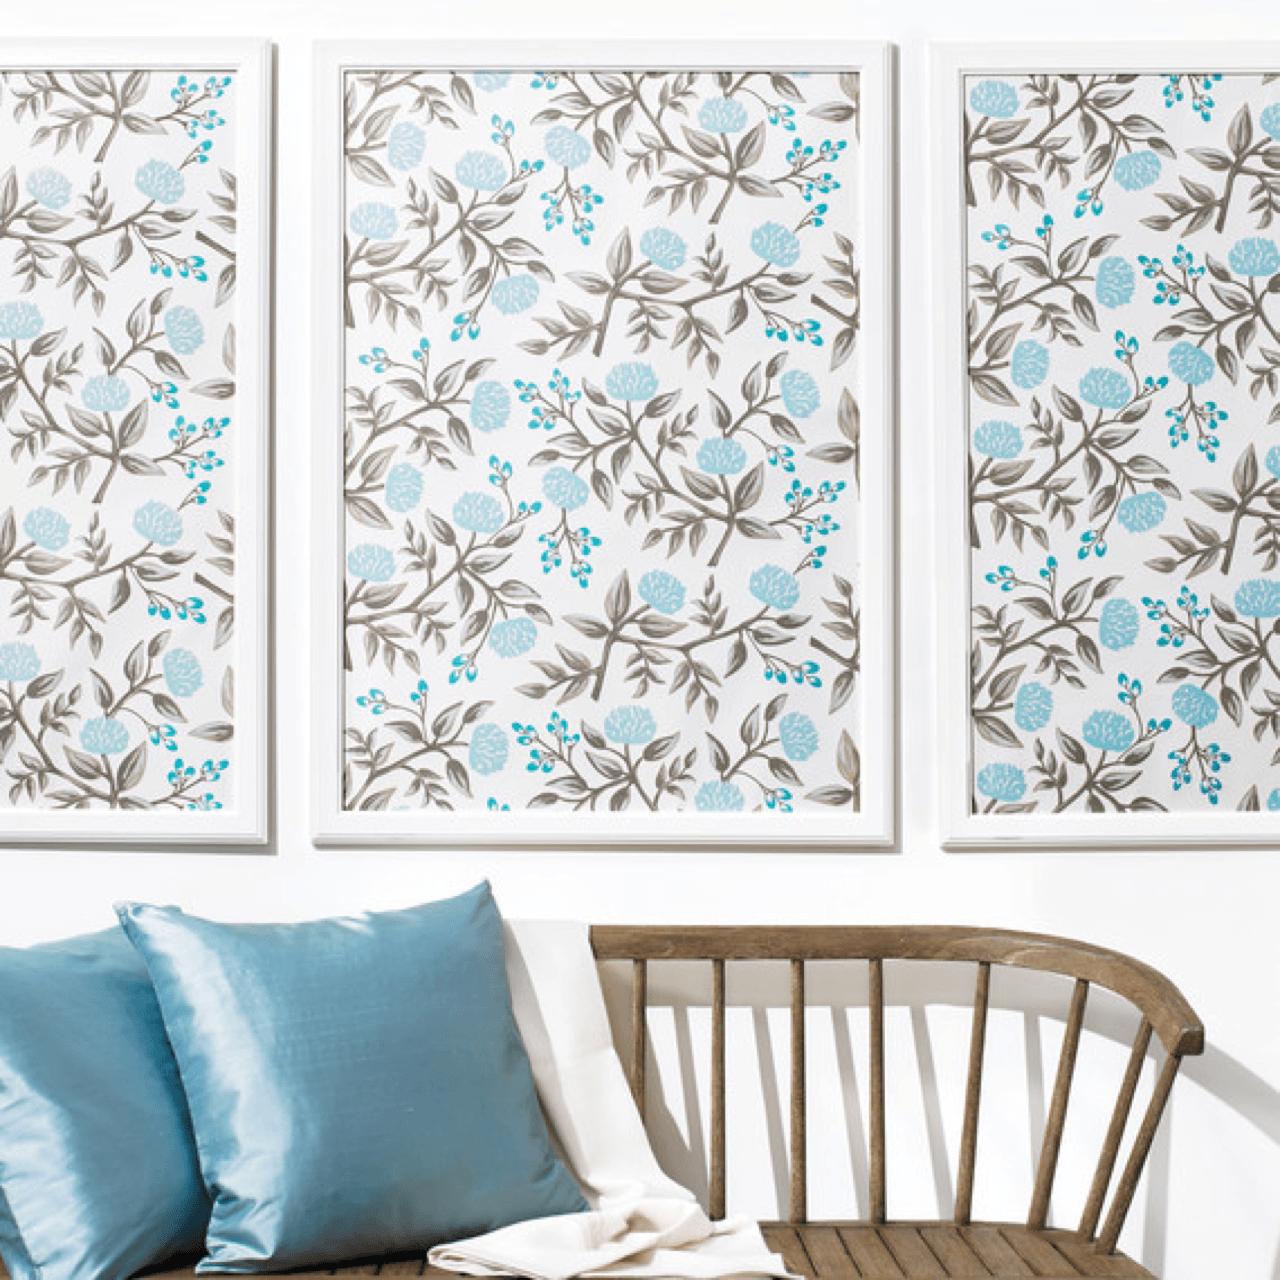 Ways Wallpaper No Longer Just For Walls Floral Image